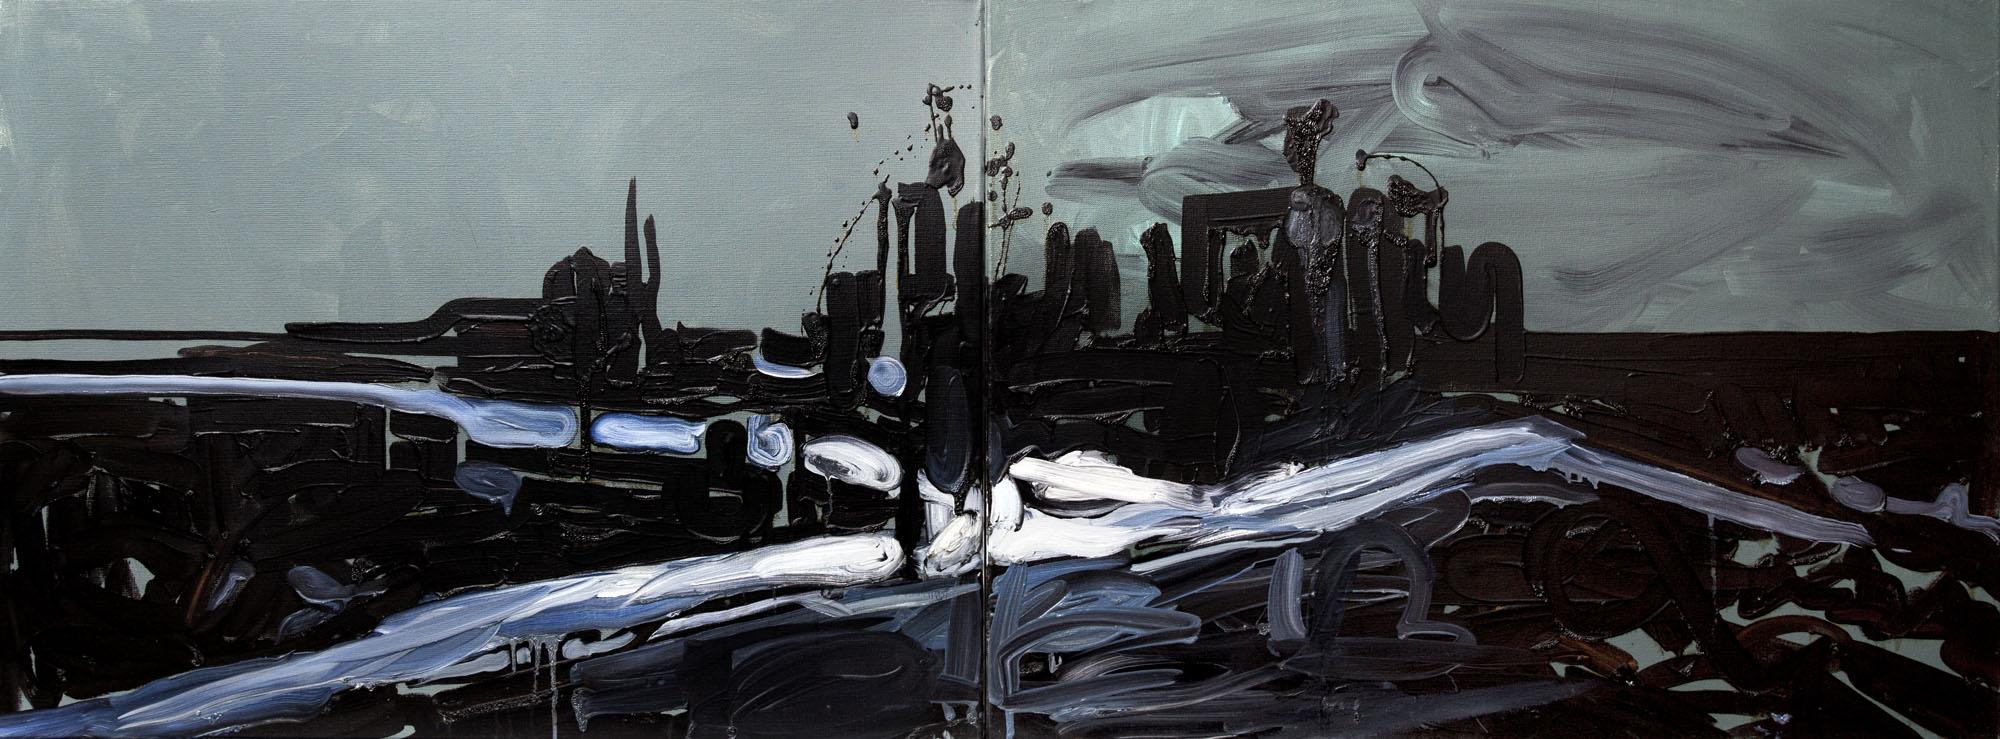 Jacek Doroszenko - The day after, painting 01